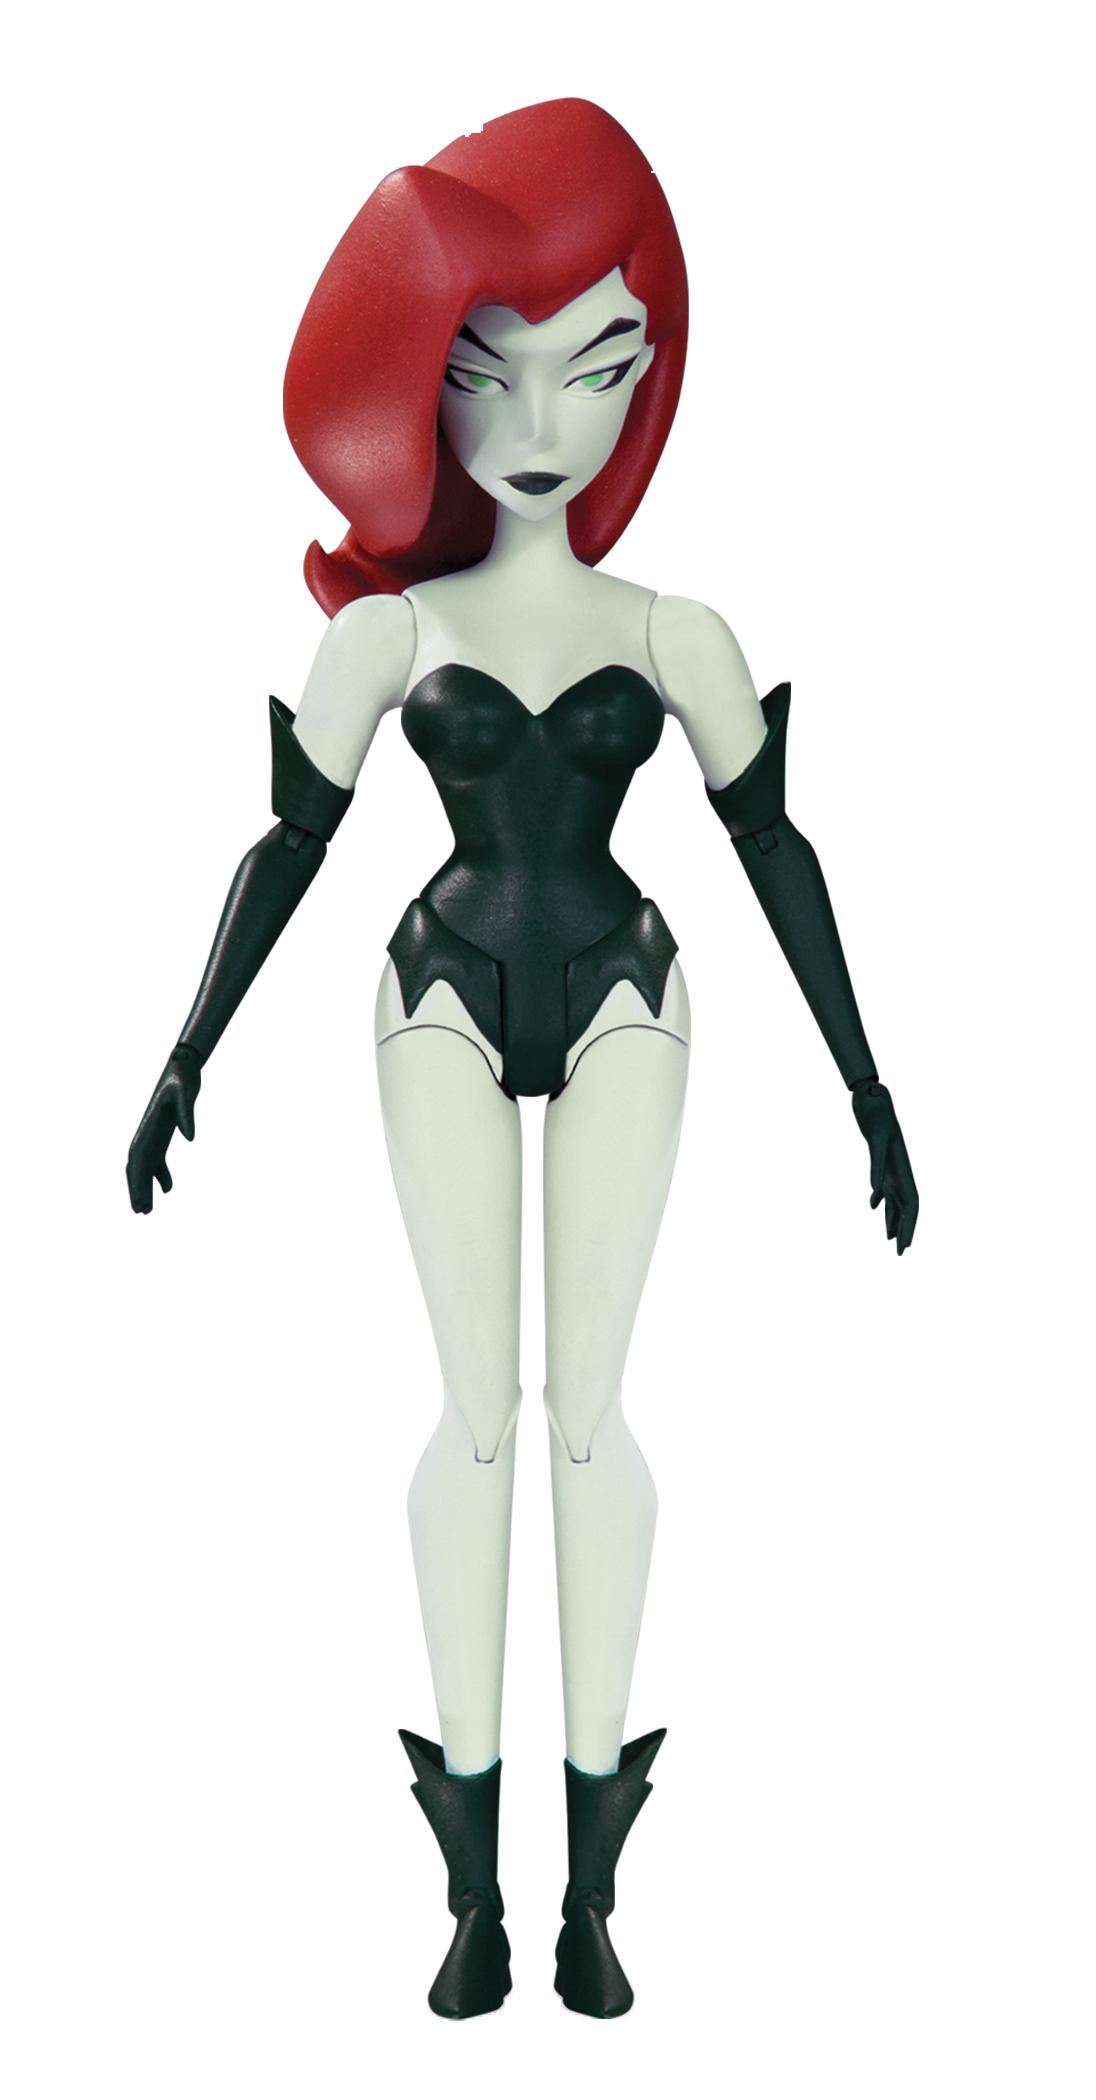 DC Comics: Batman Animated Series - Poison Ivy imagine